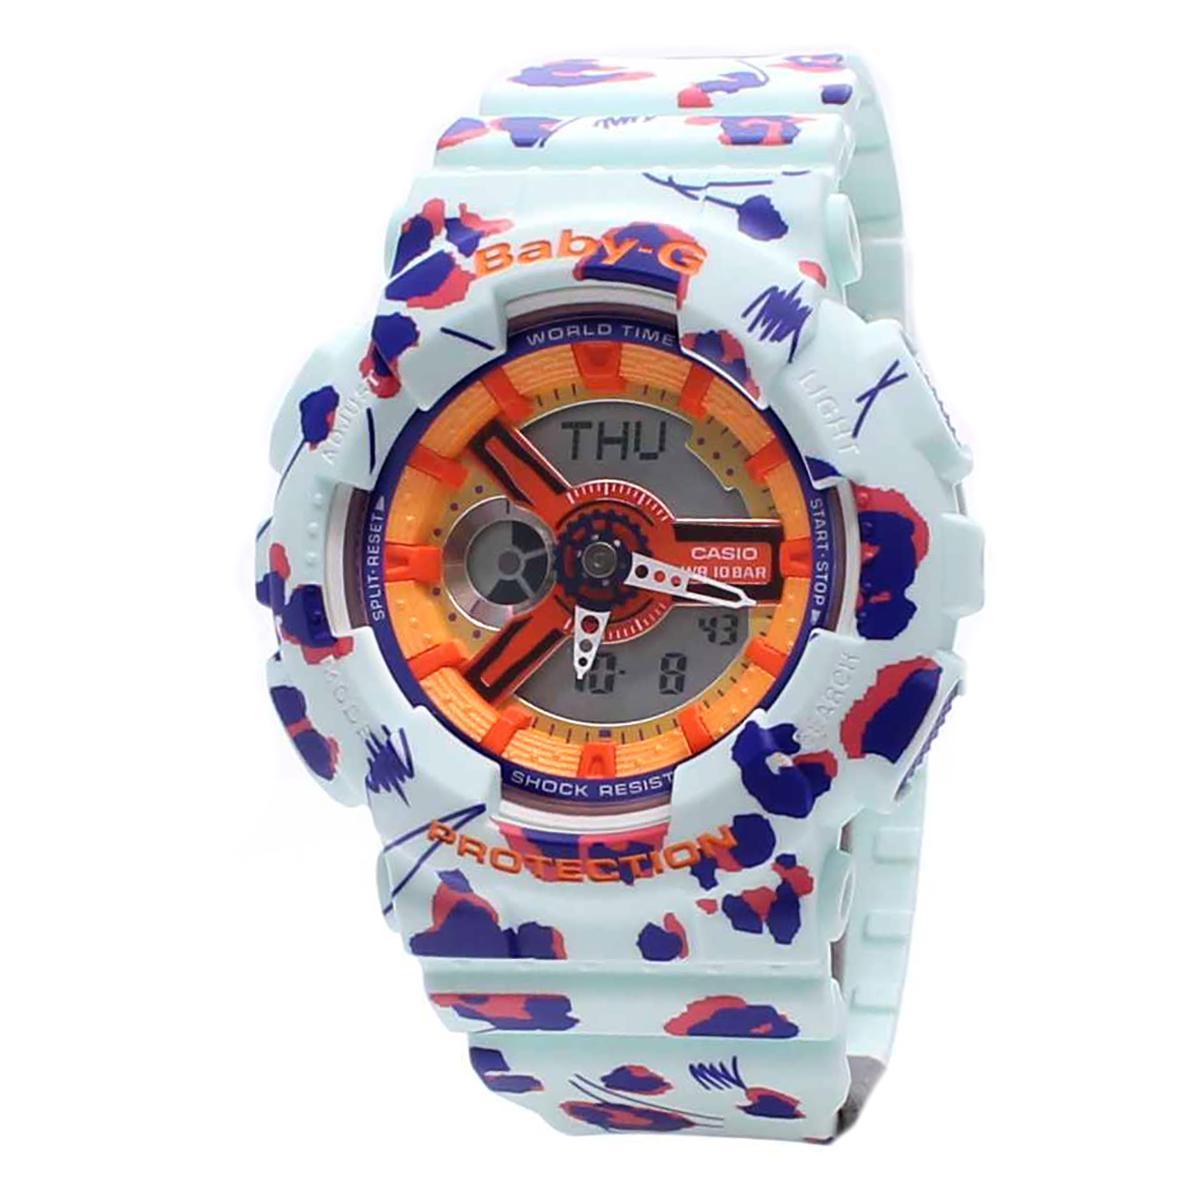 Sale Casio Watch Baby G Multicolored Resin Case Resin Strap Ladies Ba 110Fl 3A Casio Baby G Online